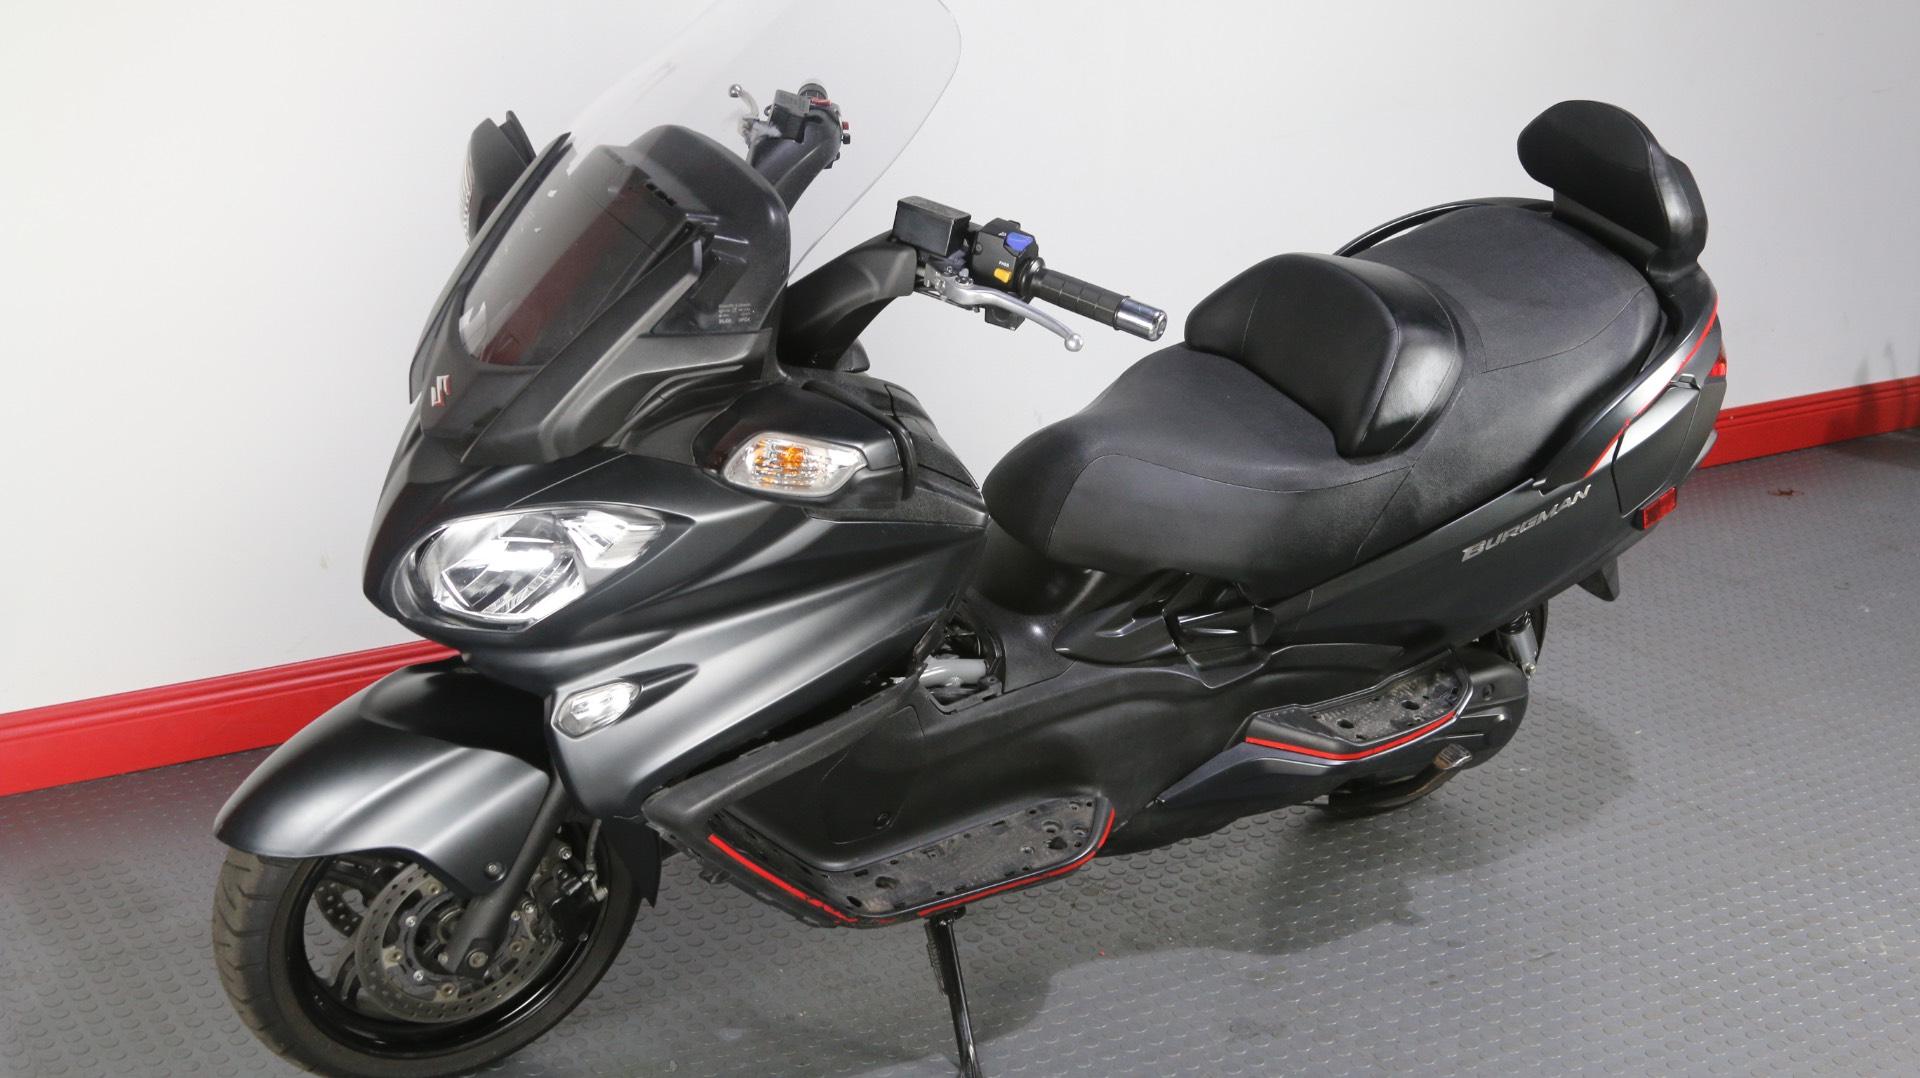 2016 Suzuki Burgman 650 Executive ABS in Tampa, Florida